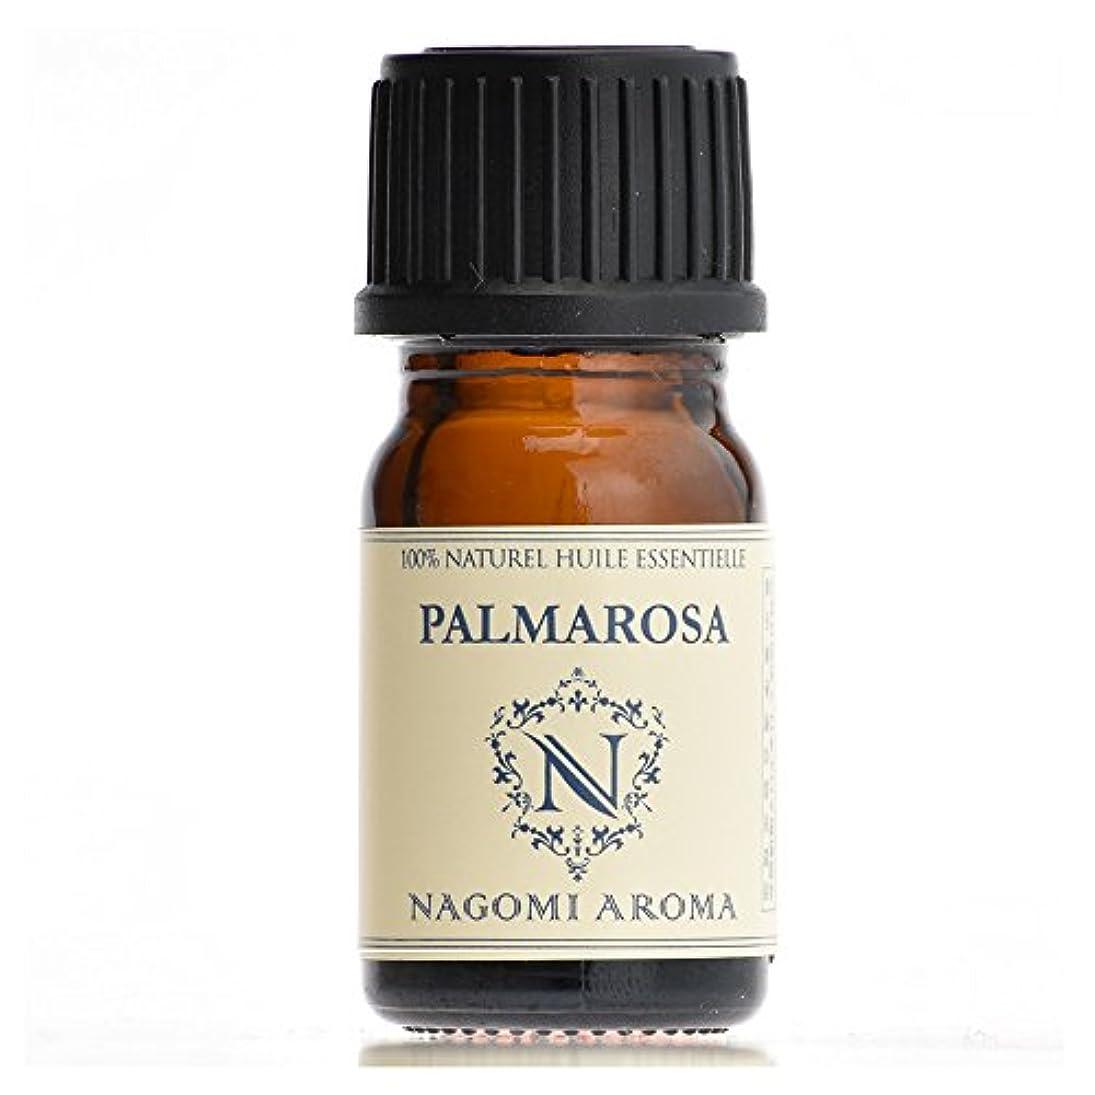 【AEAJ認定表示基準認定精油】NAGOMI PURE パルマローザ 5ml 【エッセンシャルオイル】【精油】【アロマオイル】|CONVOILs